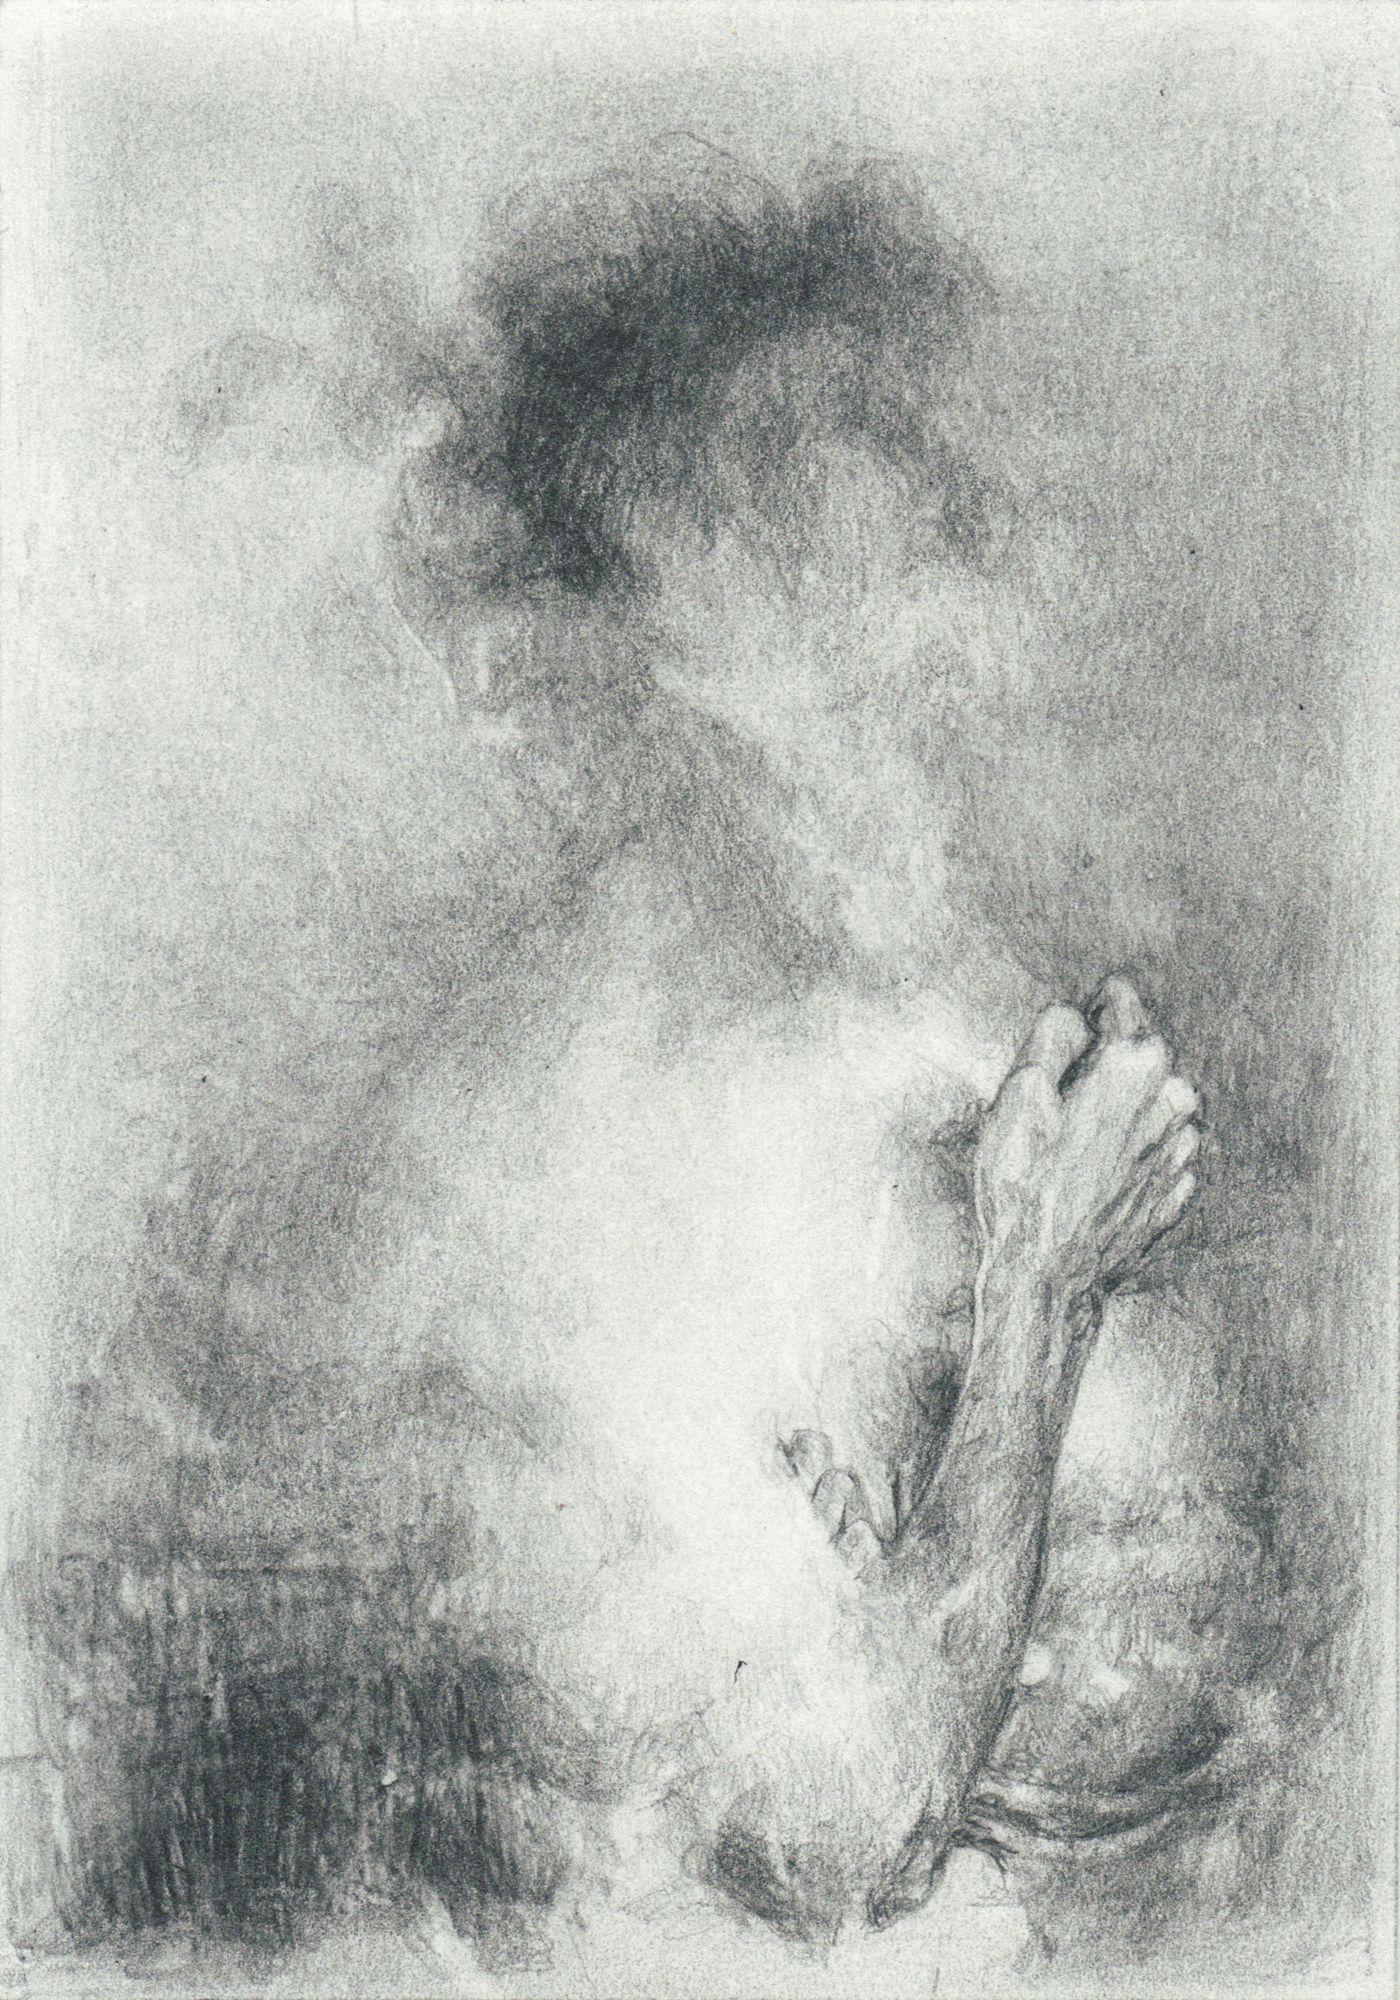 Kang Seung Lee, Untitled (Goh Choo San 2), detail